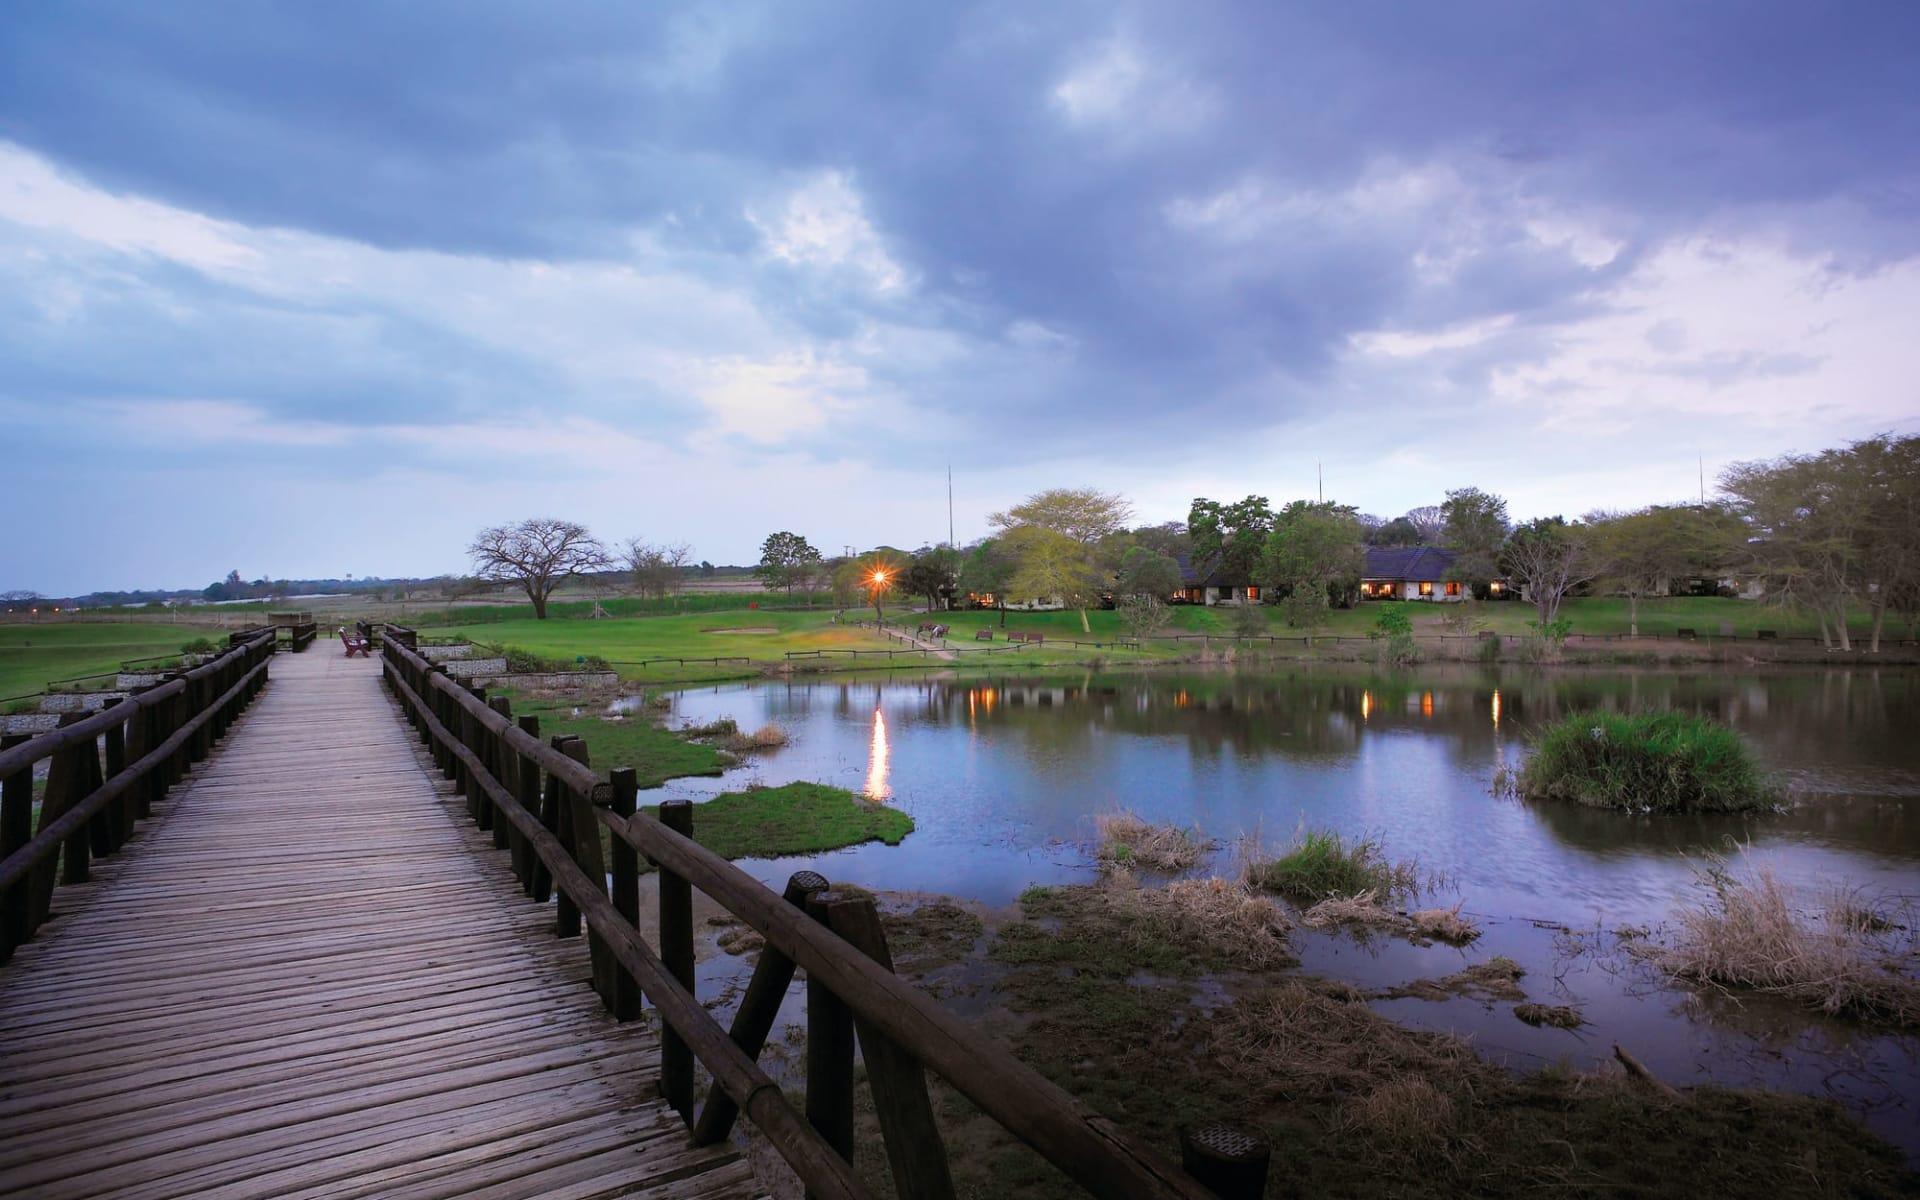 Sabi River Sun Resort in Hazyview: Sabi River Sun Resort - Blick auf Hotelanlage